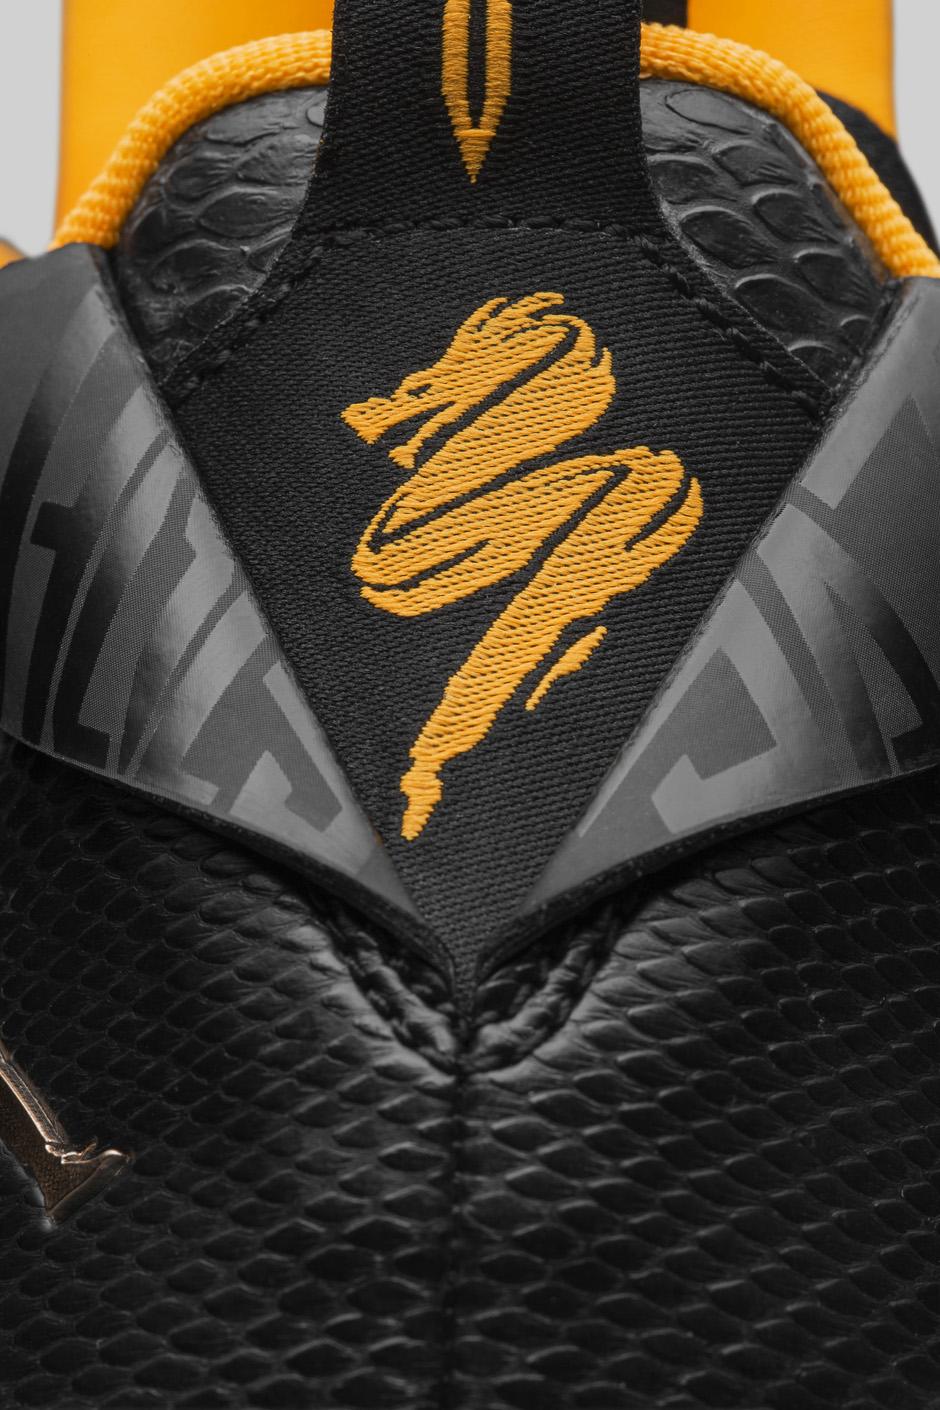 ... Air Jordan 1 (I) Retro Low Puerto Rico National Team Pack 42d4c22fe